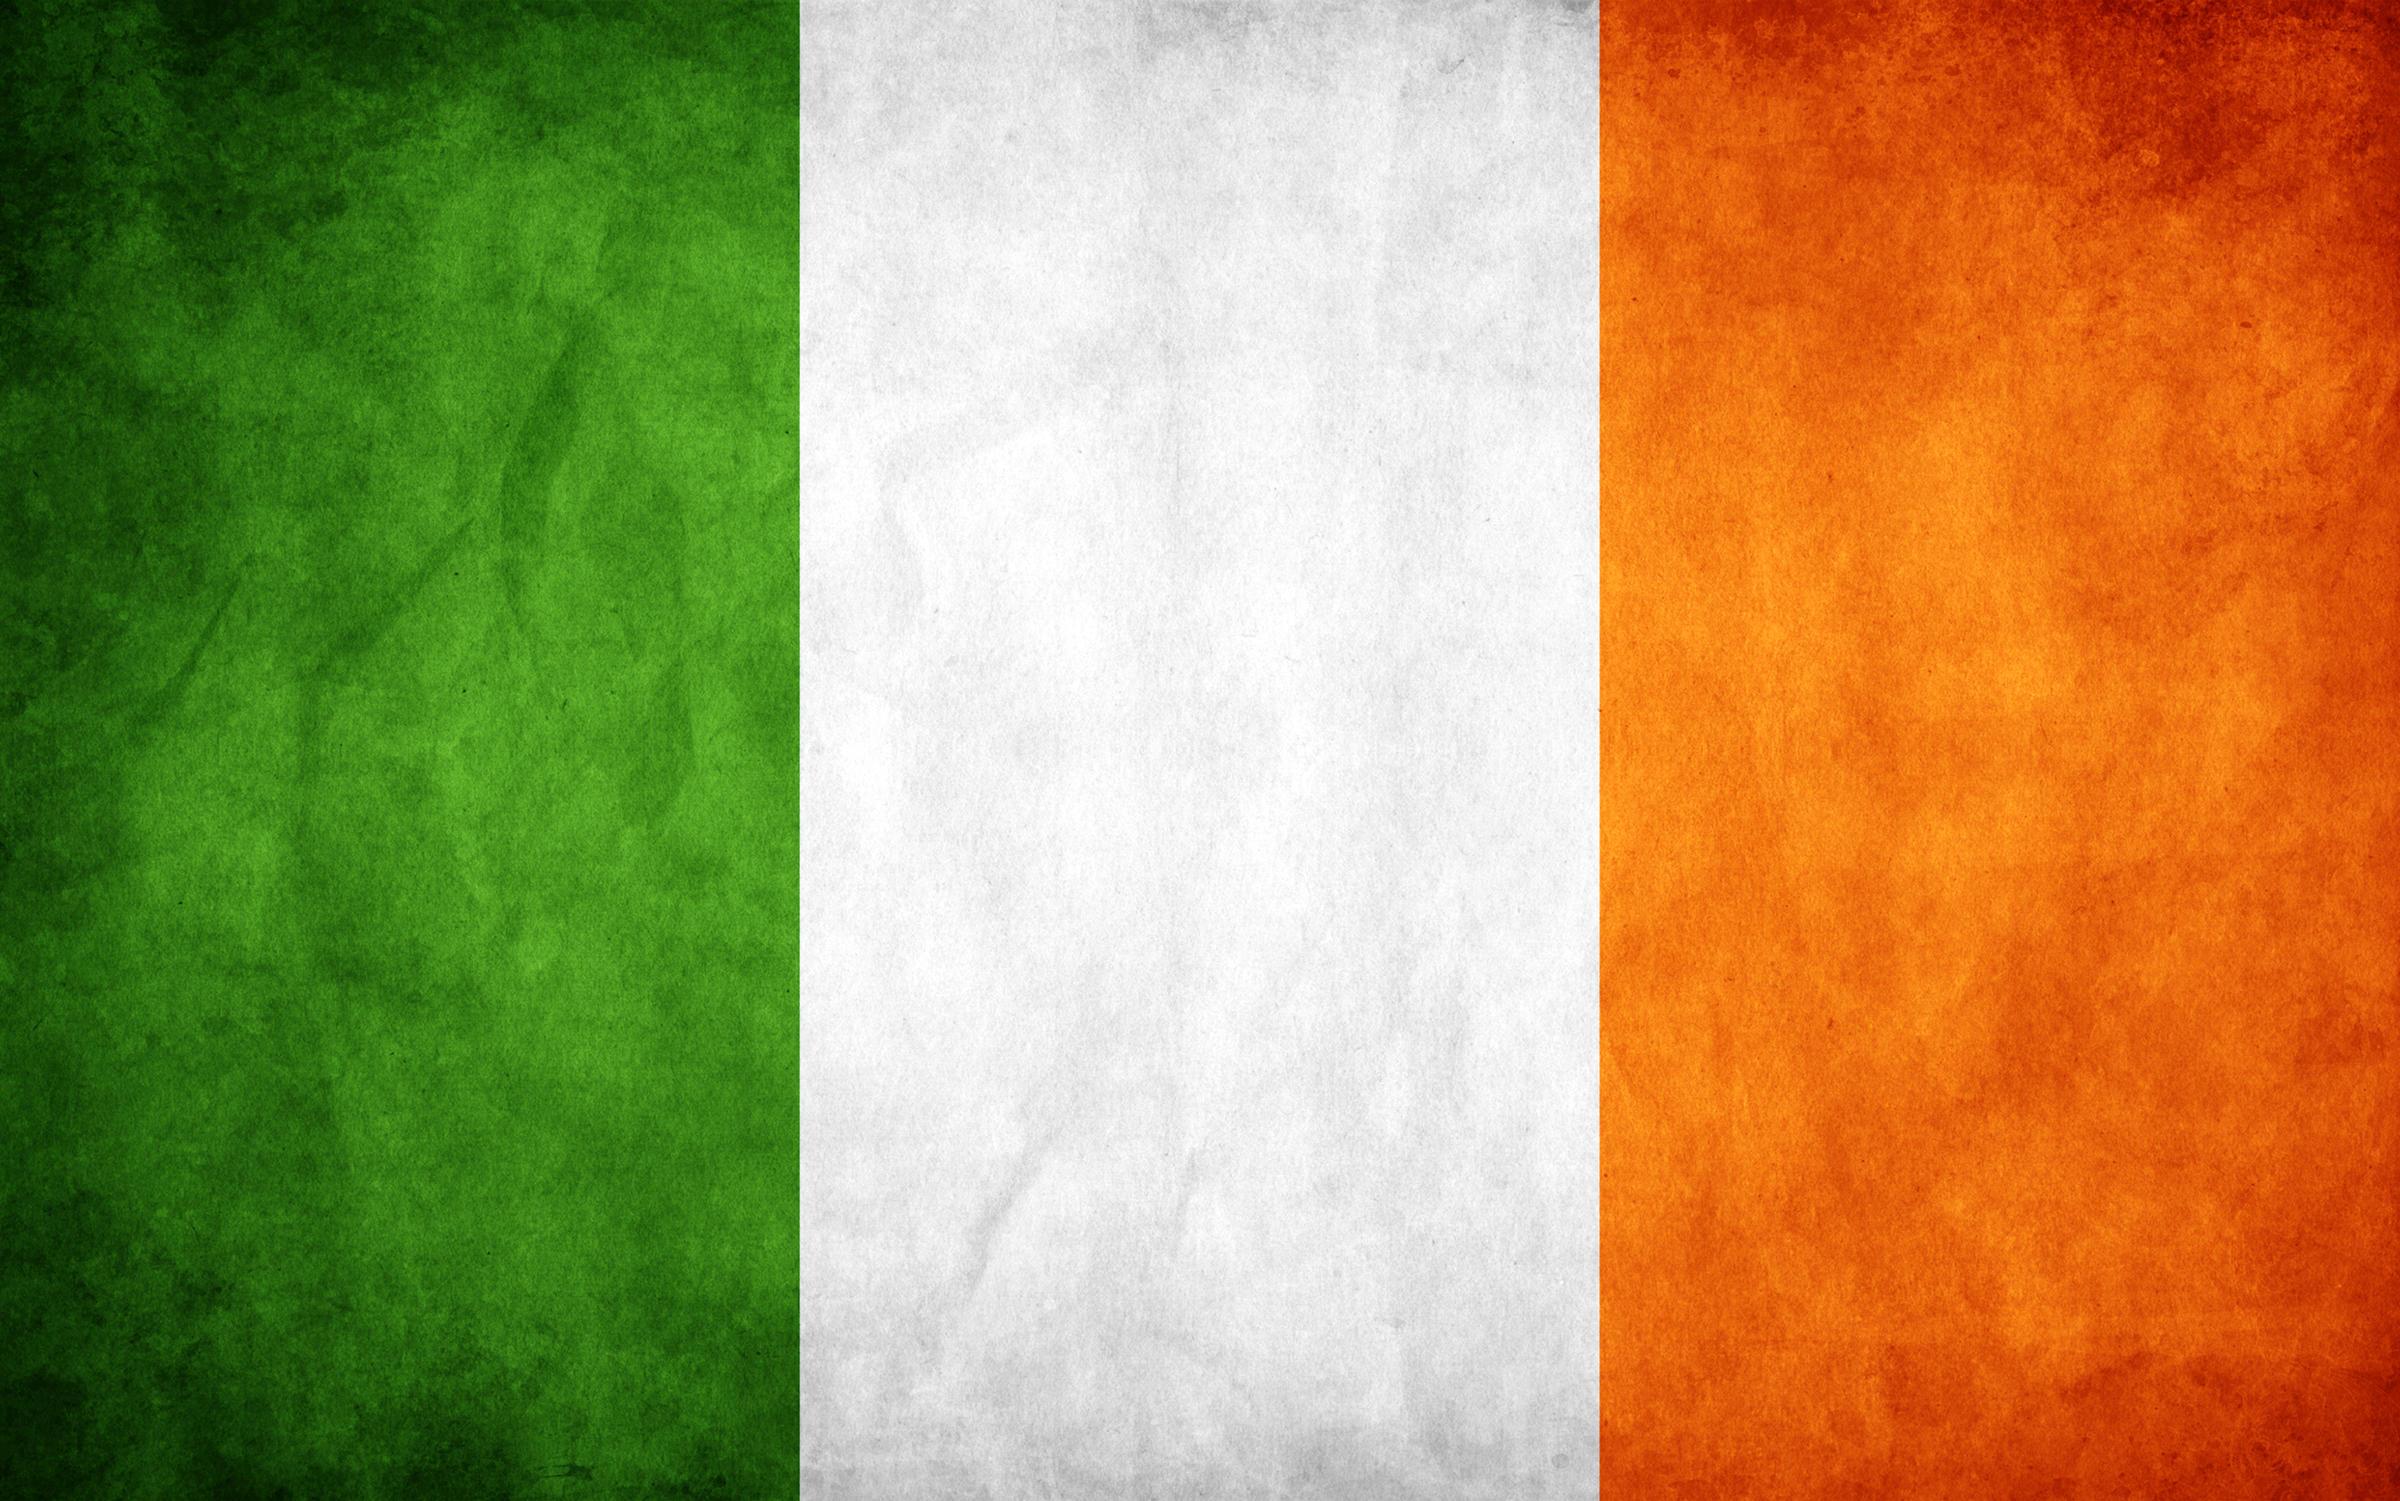 ireland s tricolour flag wdiy